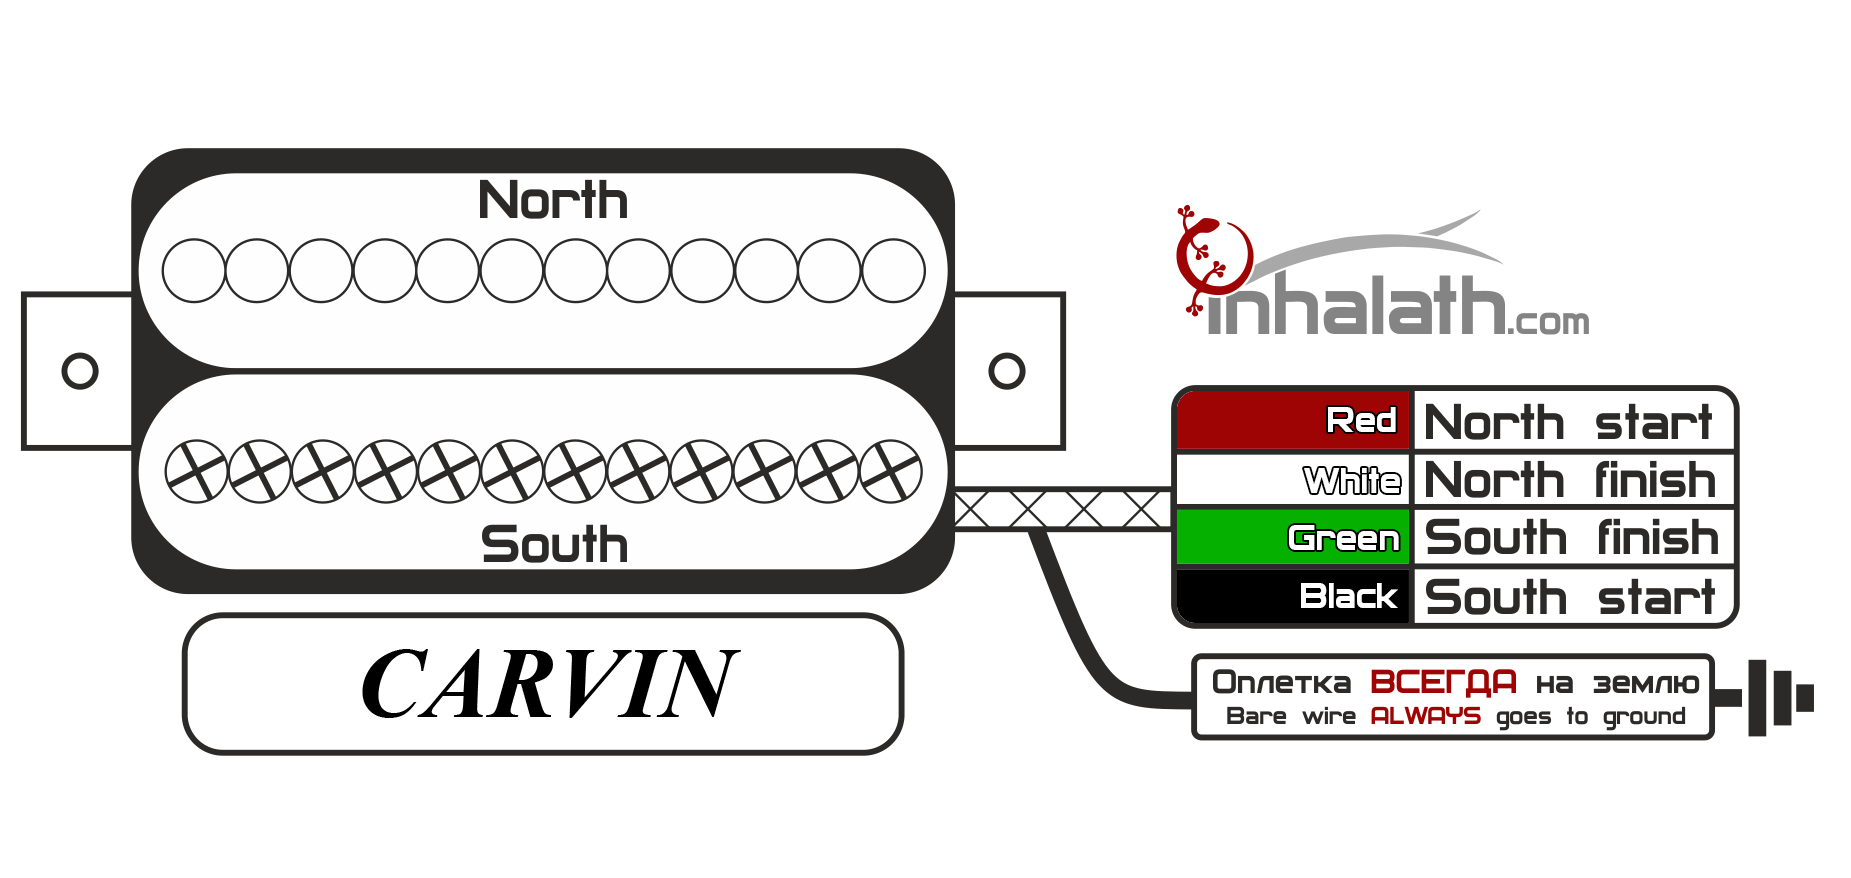 Epiphone Les Paul Wiring Diagram Re Wi66 Pro Pickup – Epiphone Les Paul Wiring Diagram